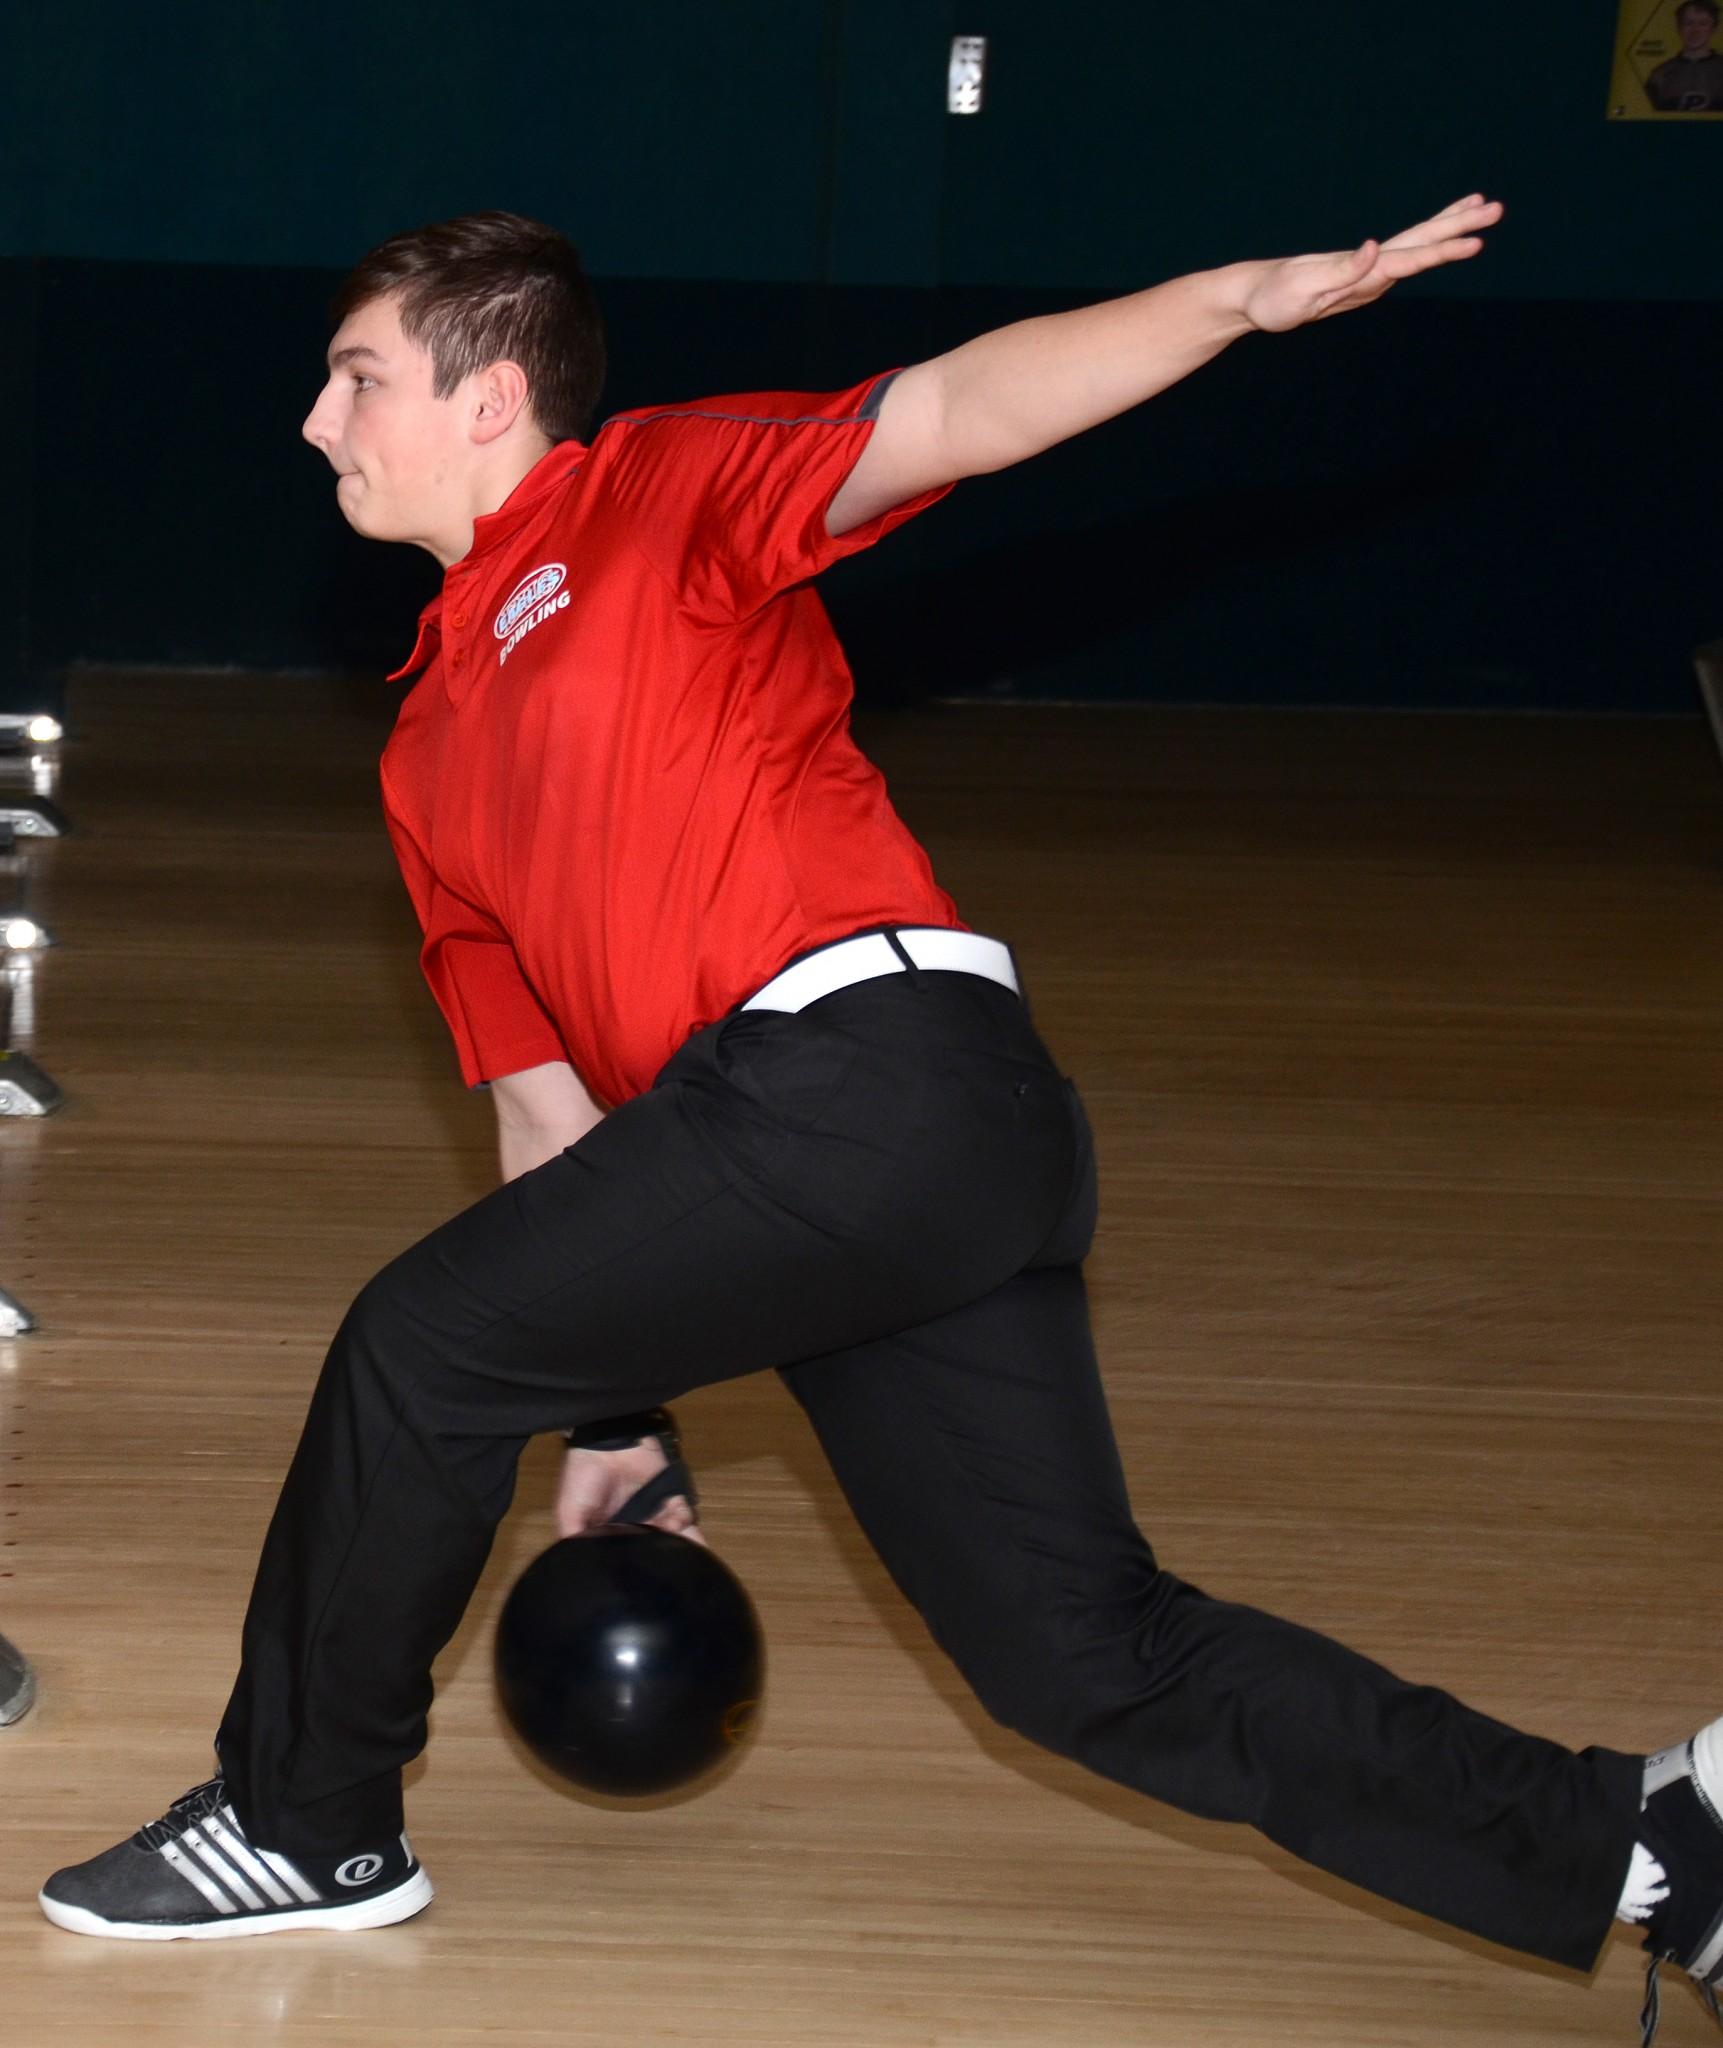 Eastwood bowler Noah Jankowski. (Press photo by Ken Grosjean)